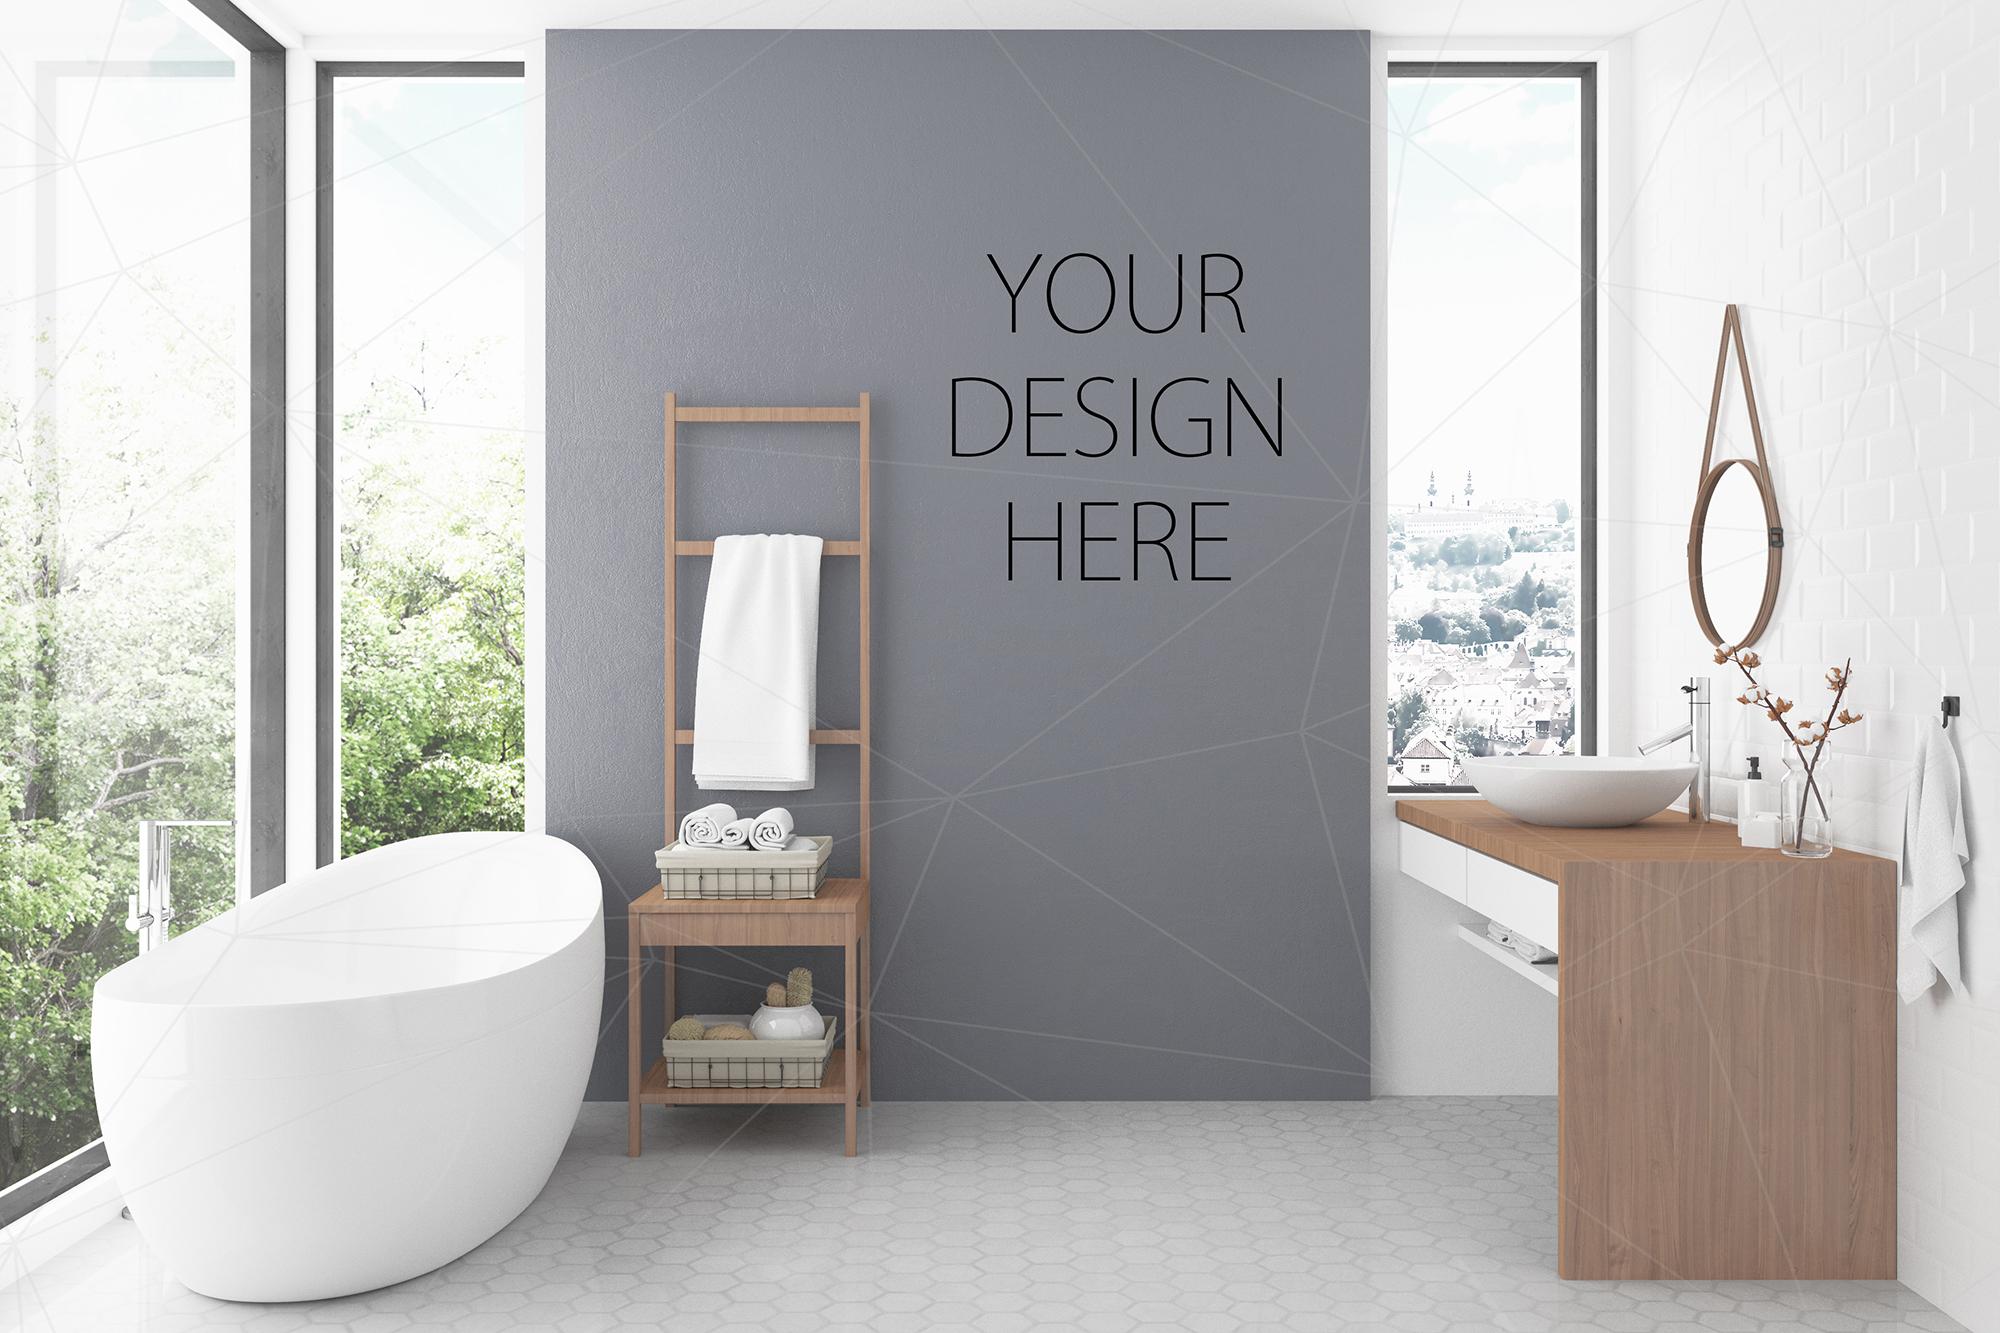 Interior Mockup Bundle  Bathroom Background Example Image 1